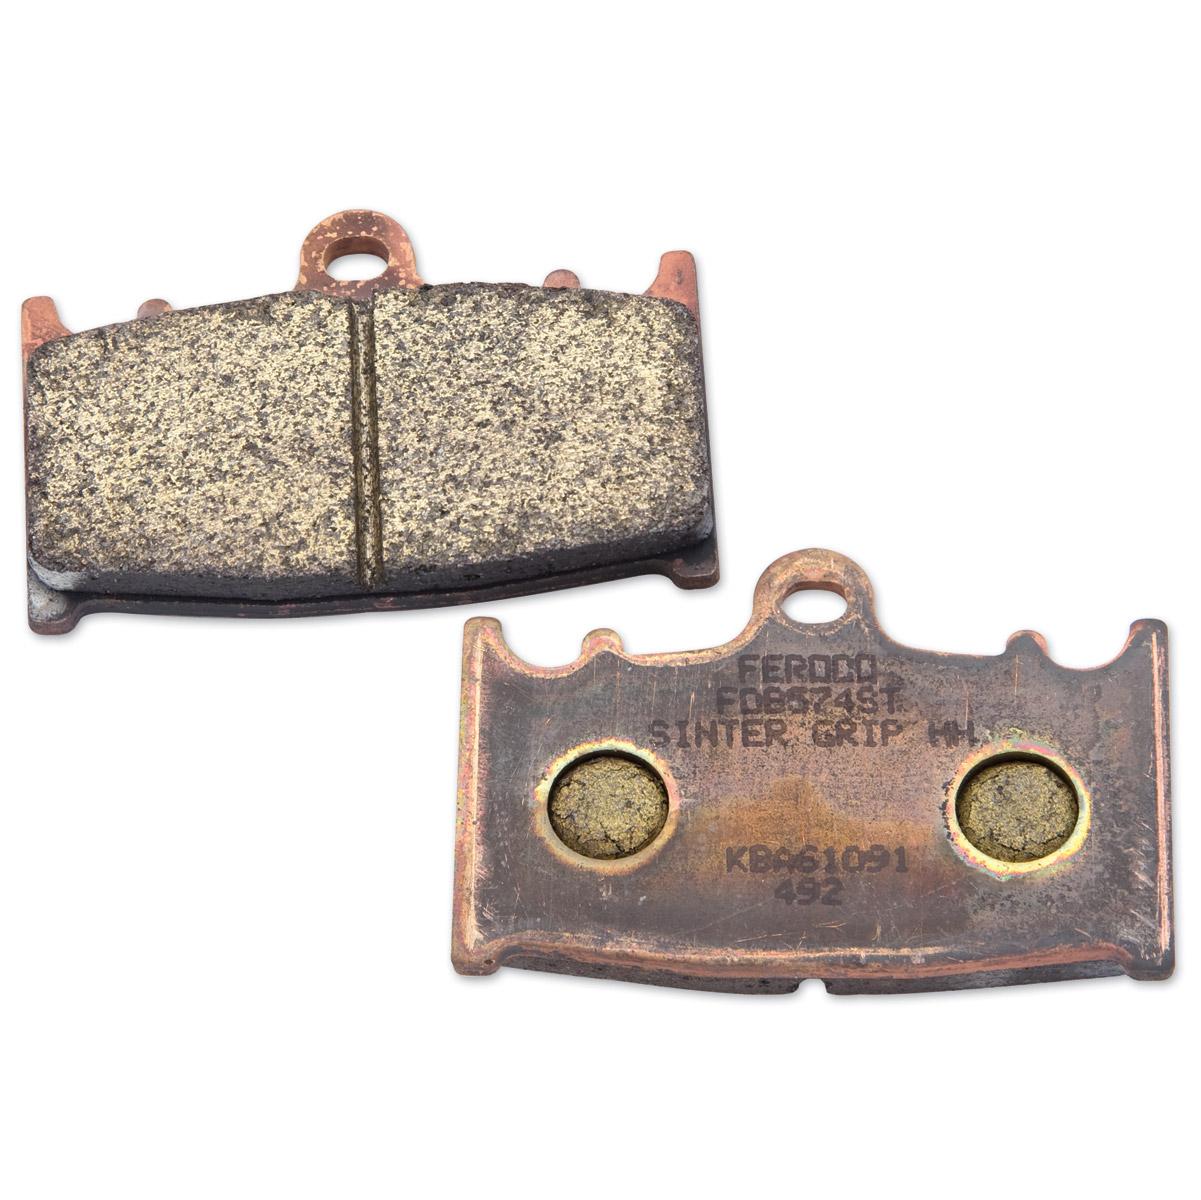 Ferodo Front Sintered Brake Pads